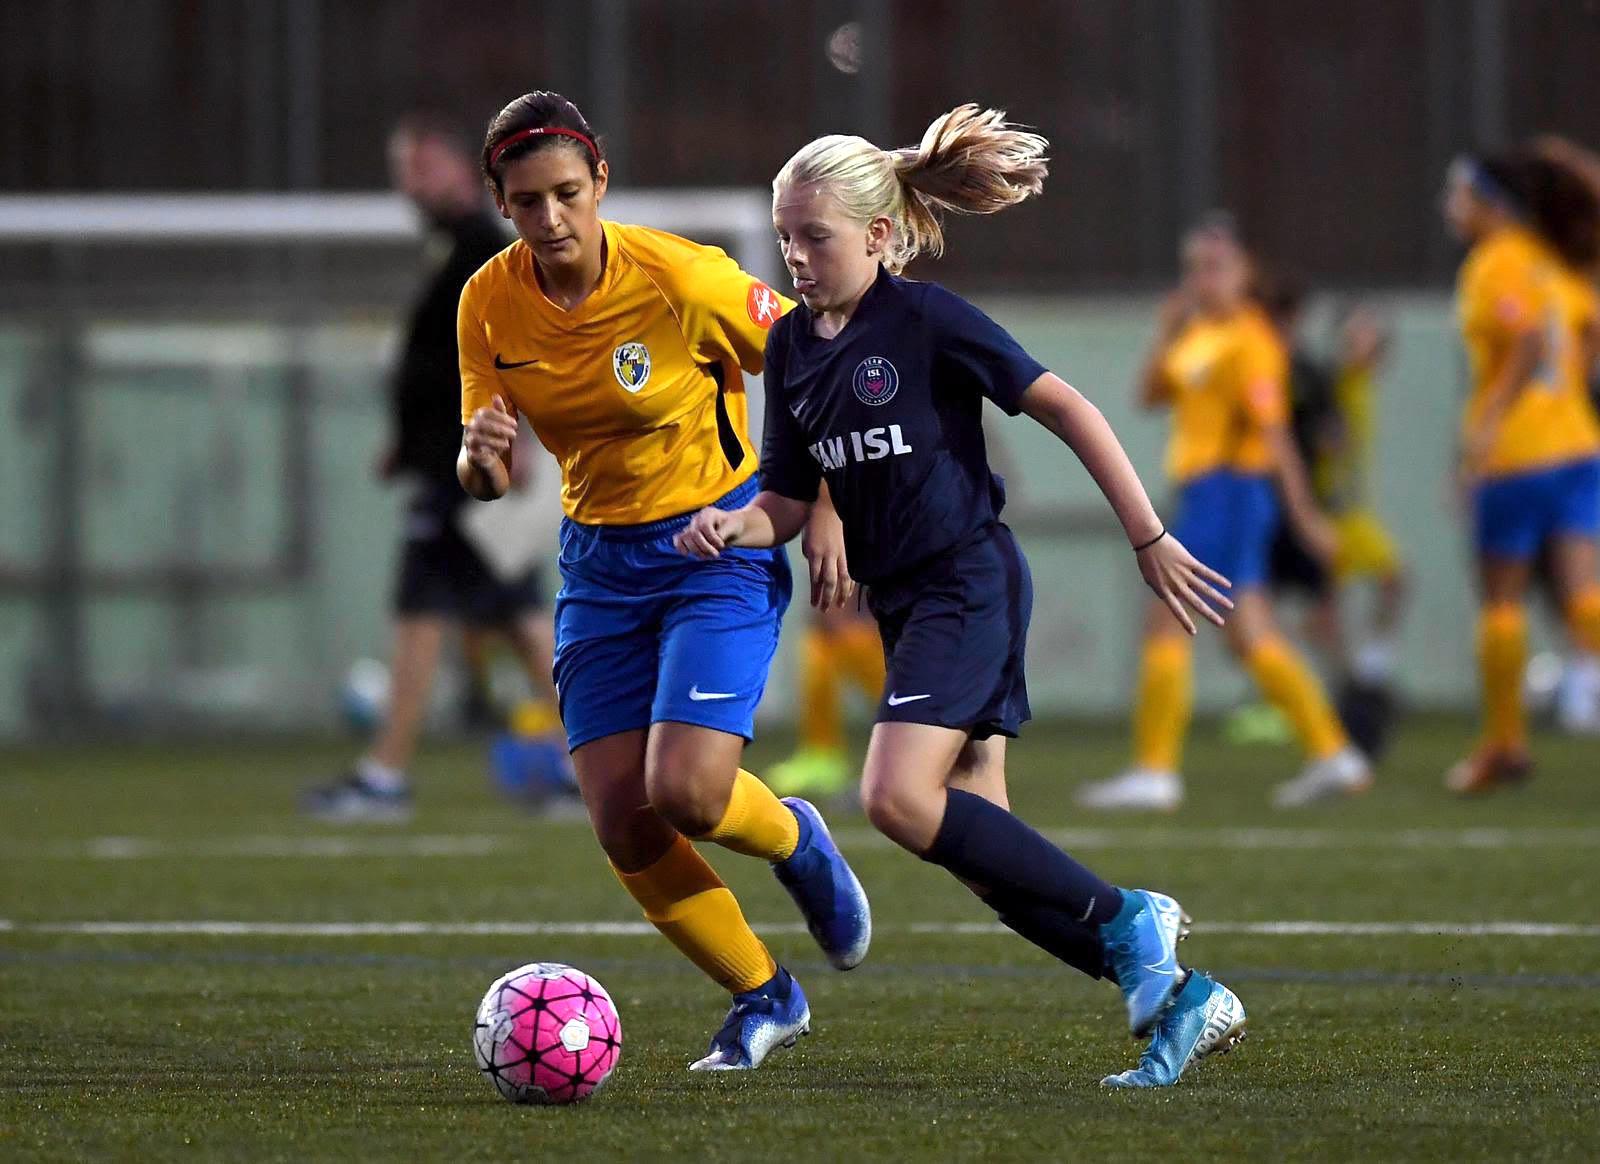 Girls playing soccer_ISL_Humanox